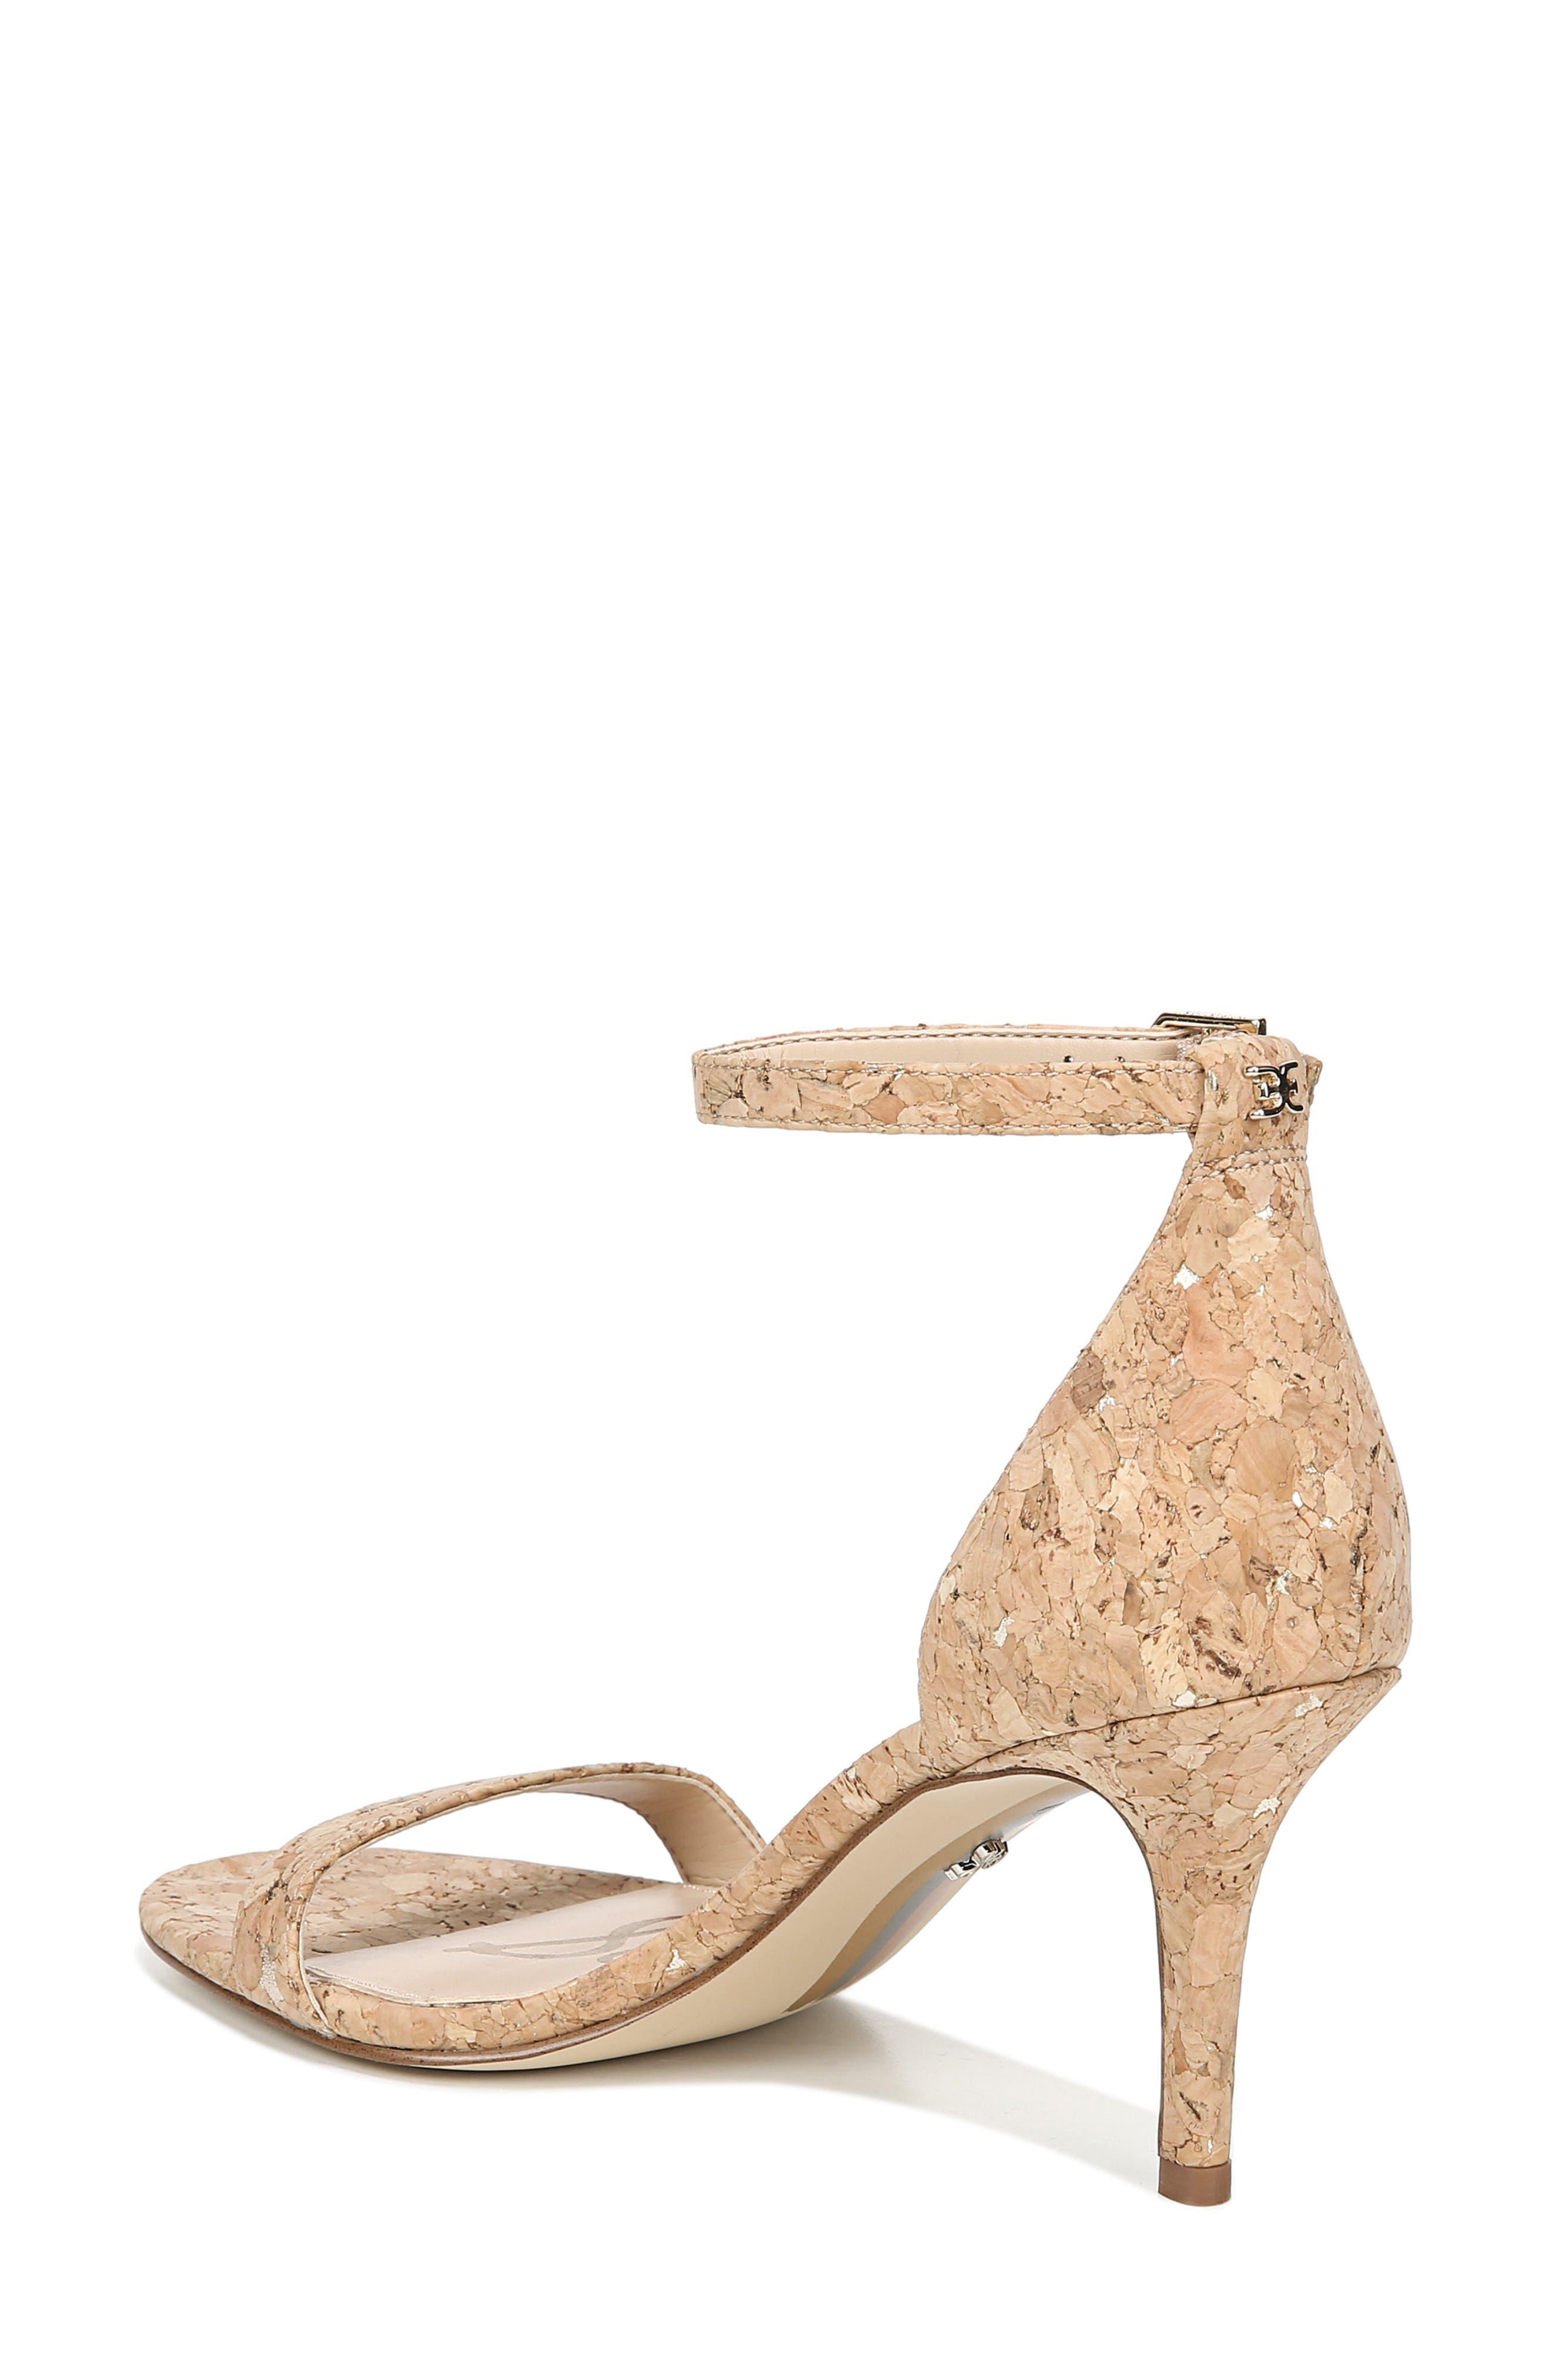 ,                             'Patti' Ankle Strap Sandal,                             Alternate thumbnail 80, color,                             251